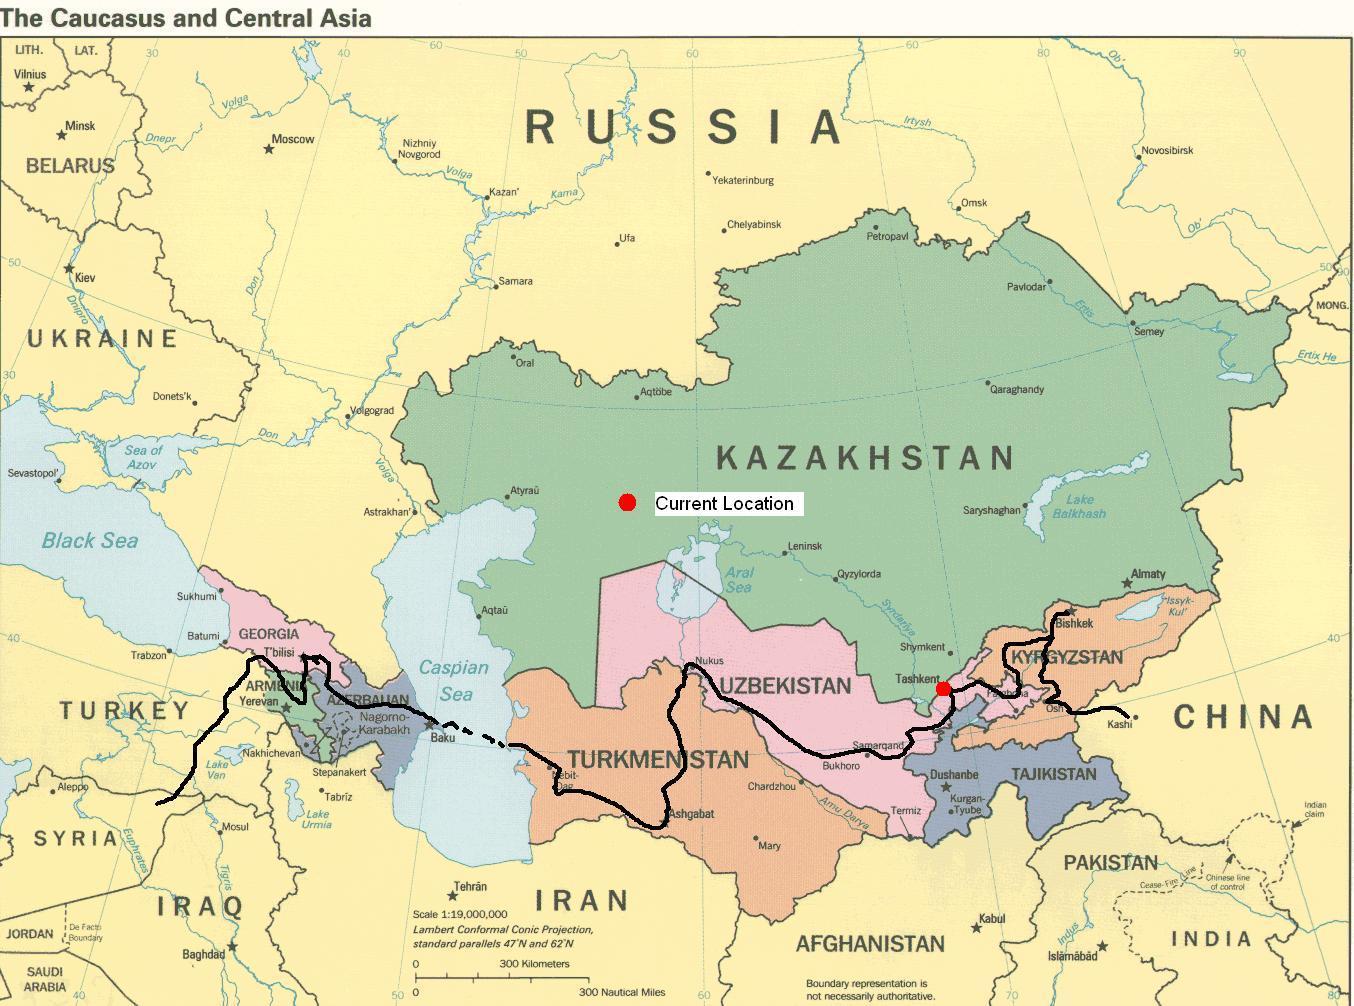 Kyrgyzstan Archives | On the road again...again